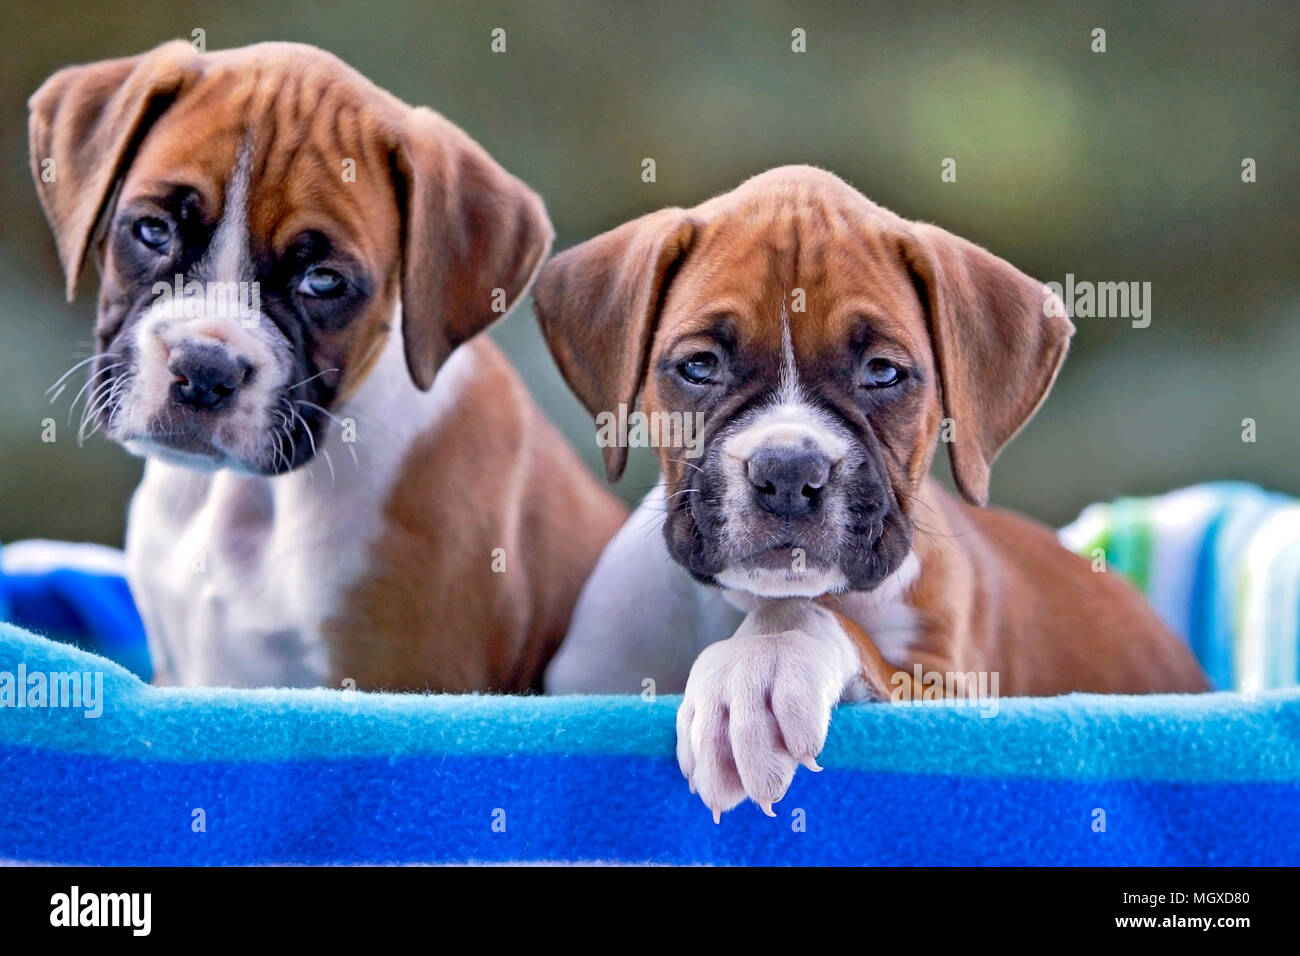 German Boxer Stock Photos & German Boxer Stock Images - Alamy